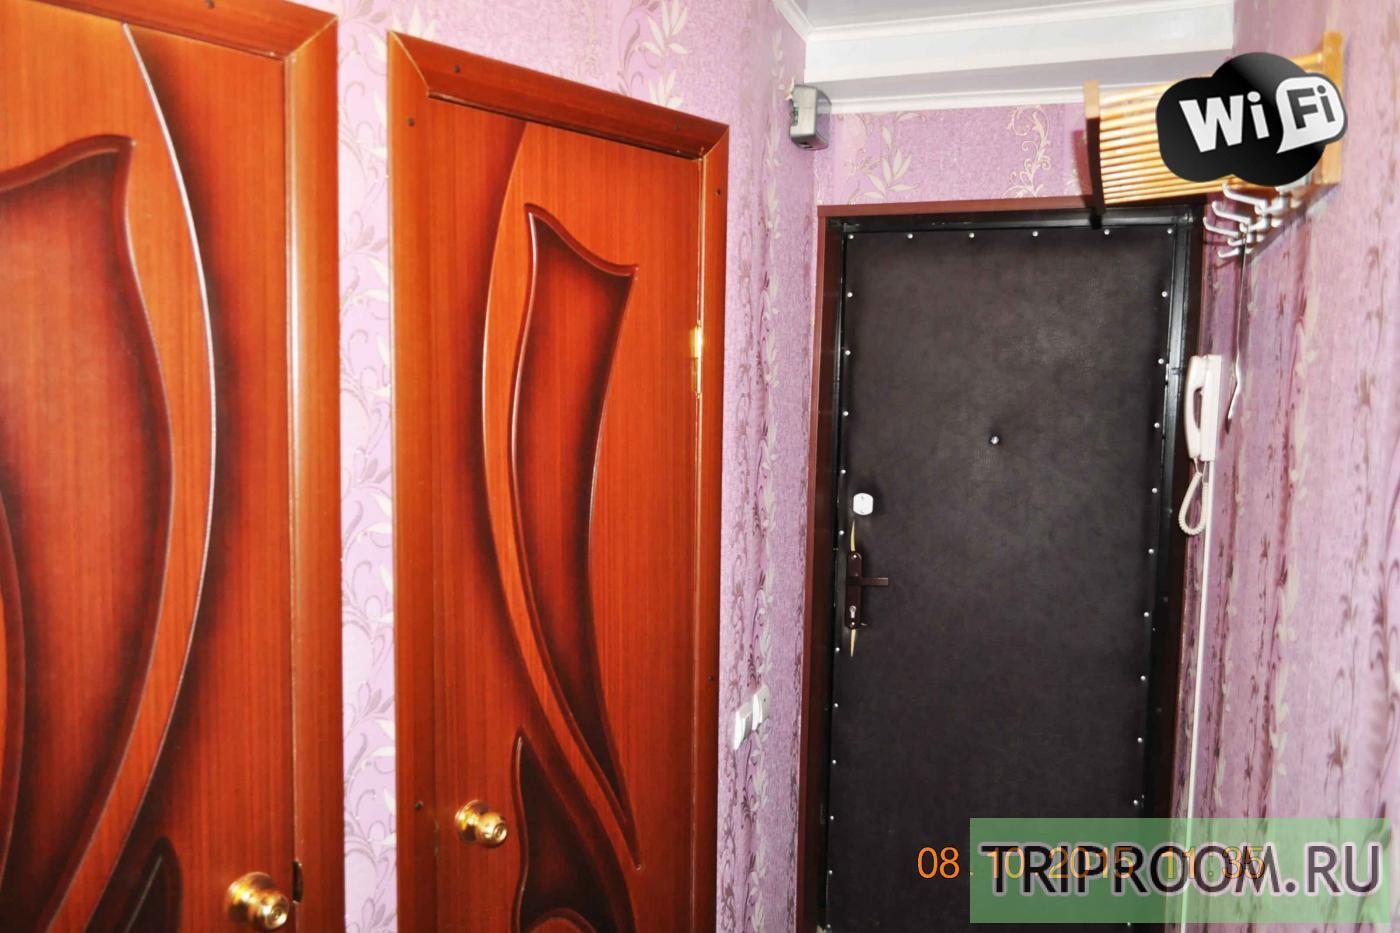 2-комнатная квартира посуточно (вариант № 11708), ул. Амосова улица, фото № 35